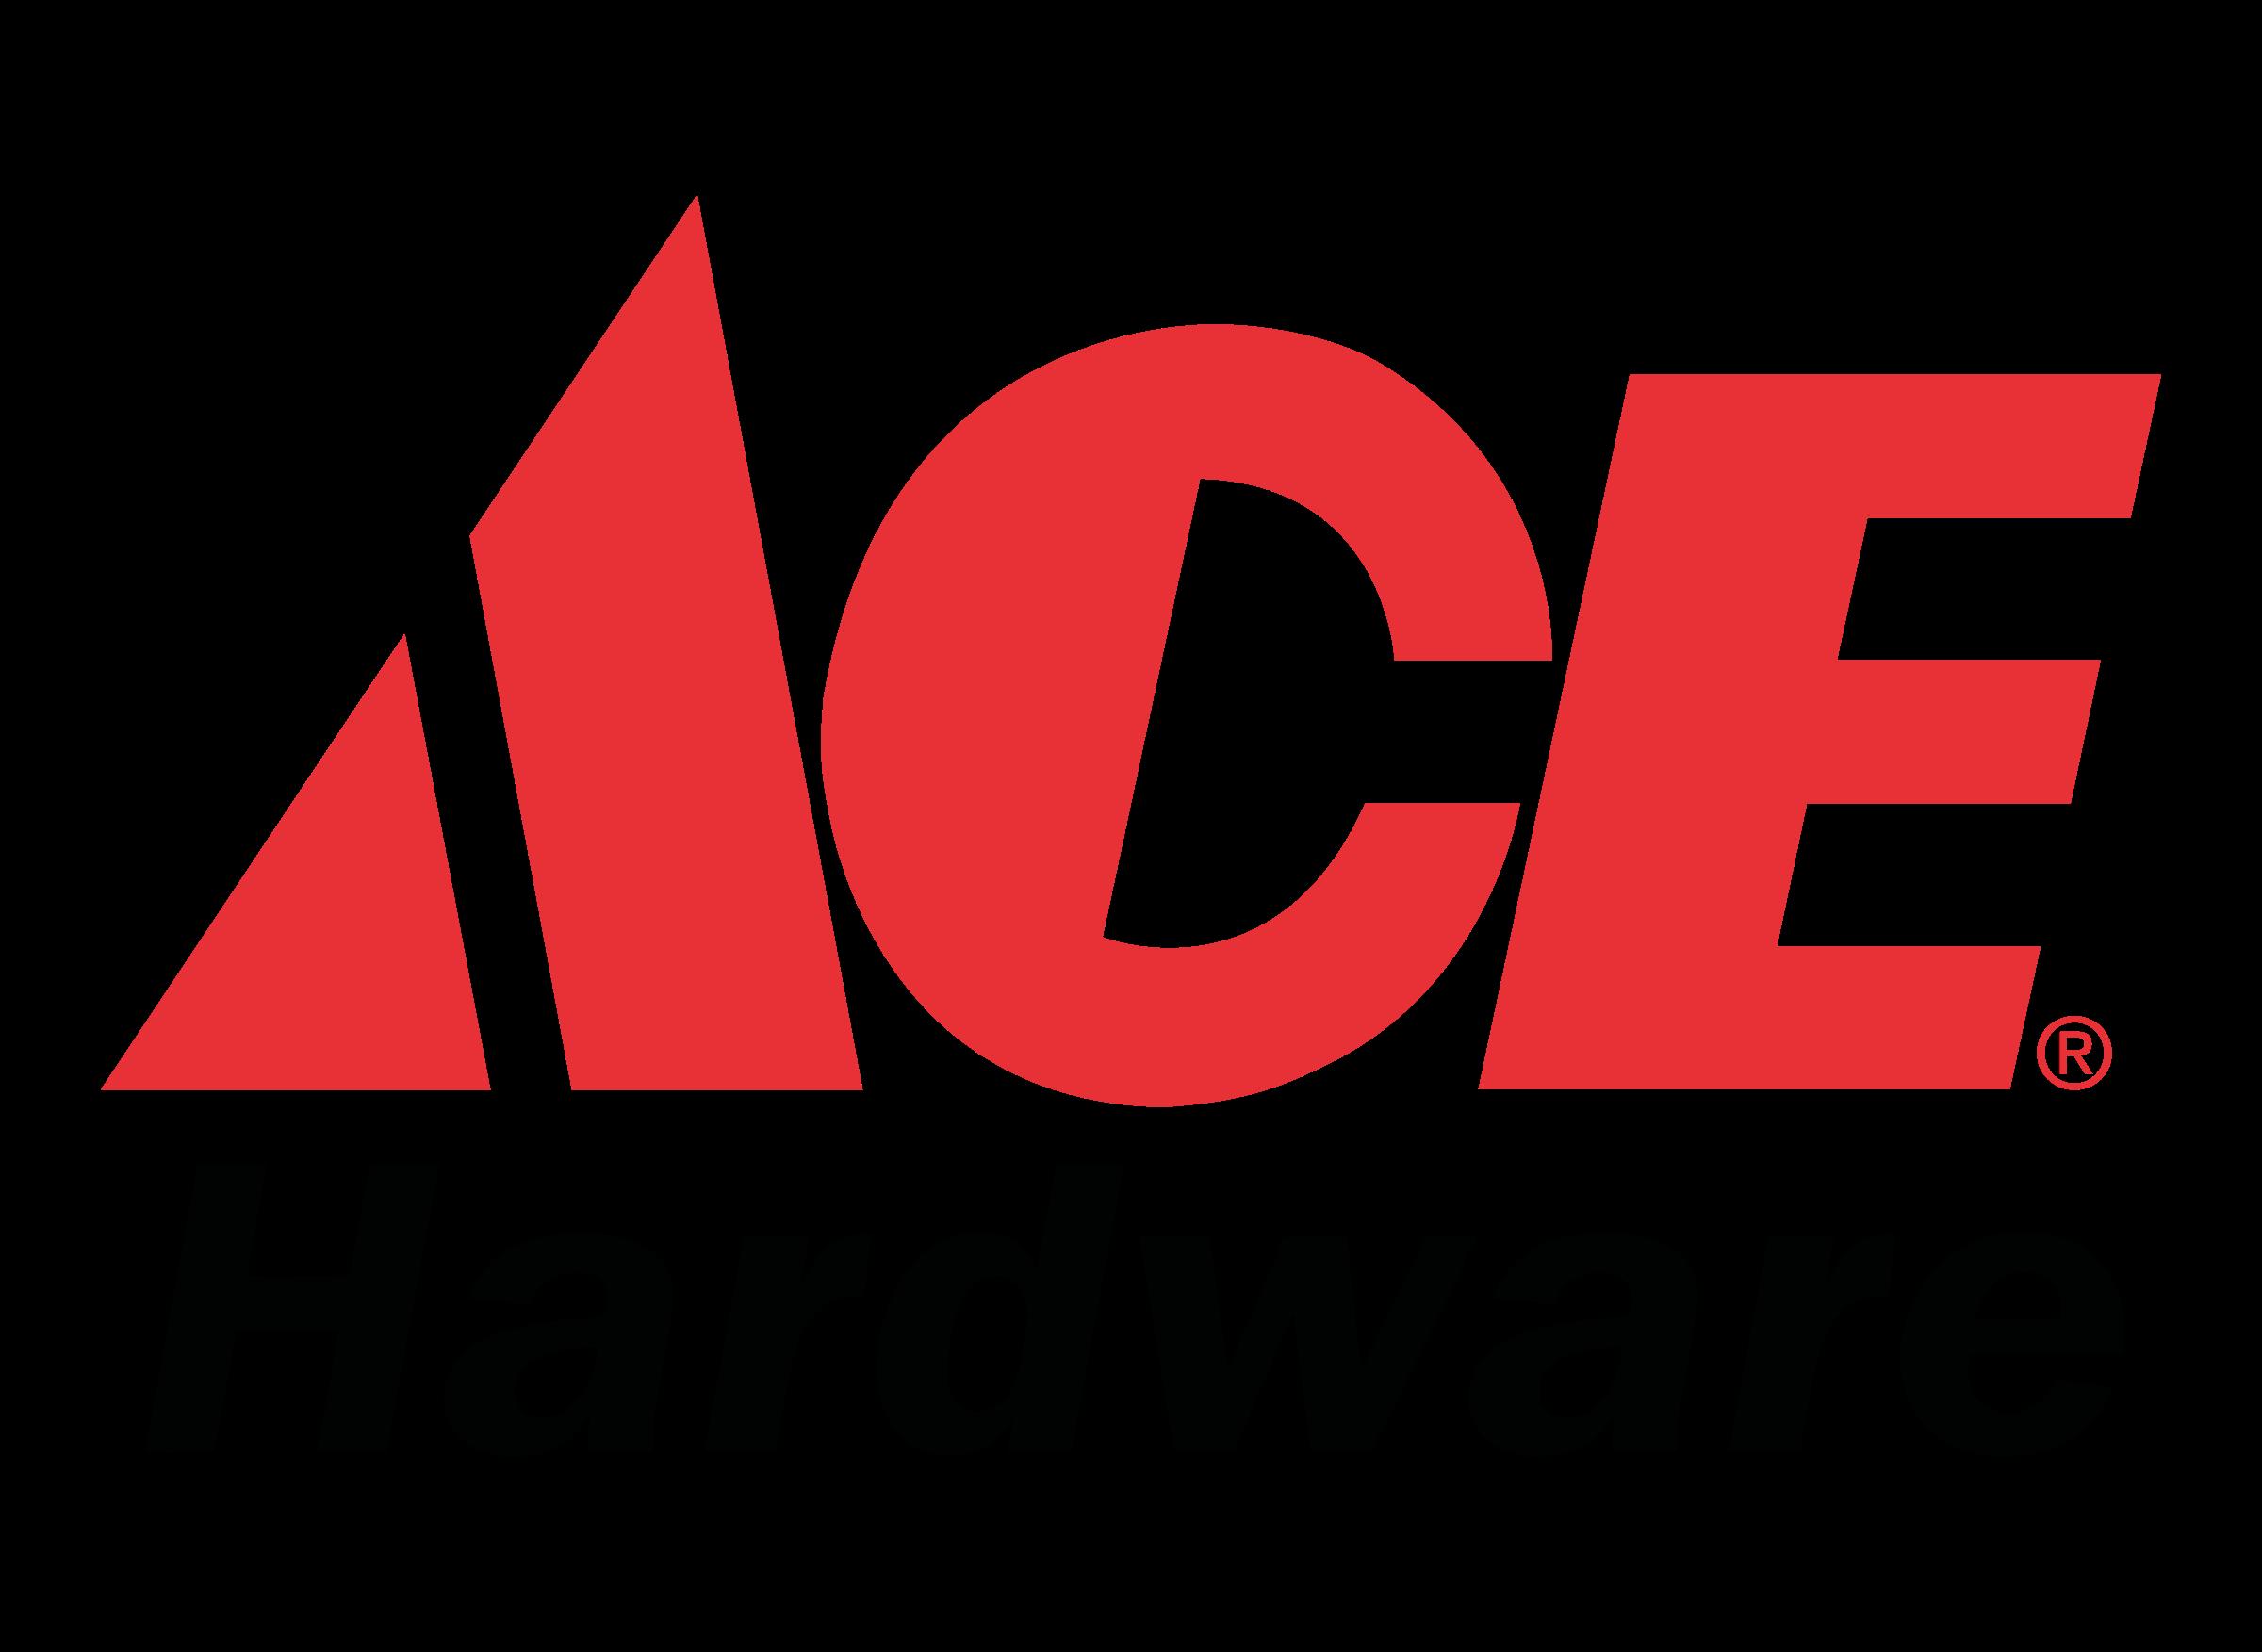 ace-hardware-logo-png-transparent